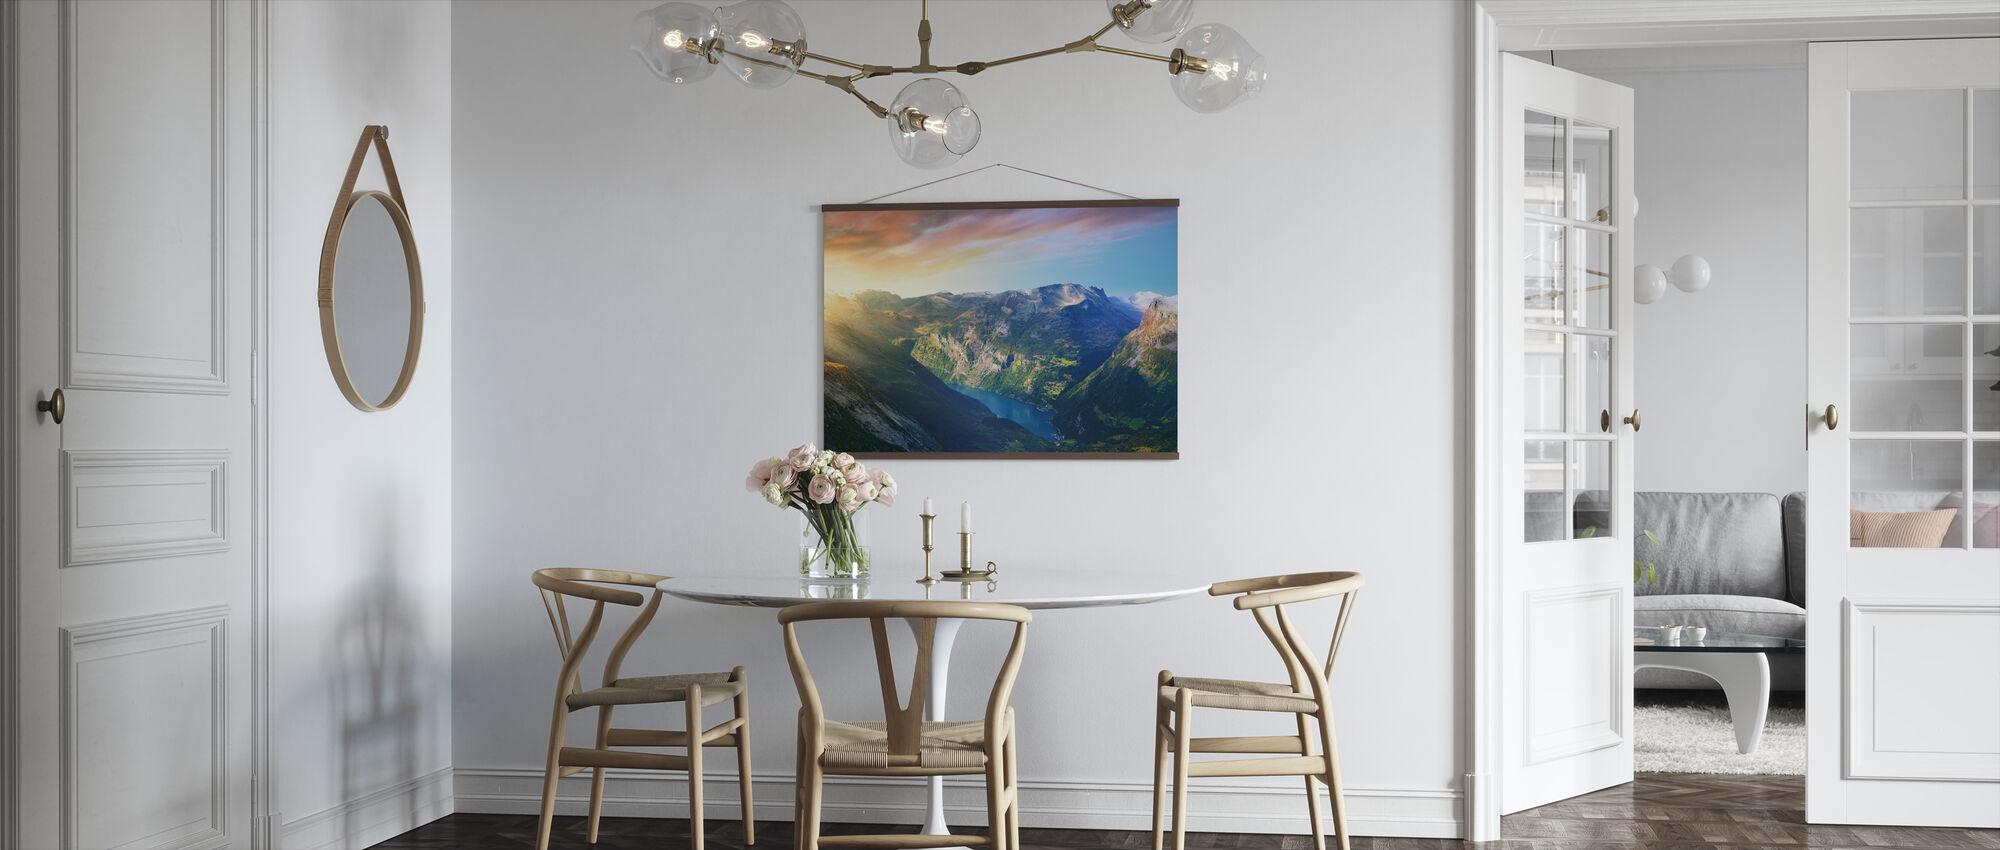 Wschód słońca nad Geirangerfjord, Norwegia - Plakat - Kuchnia